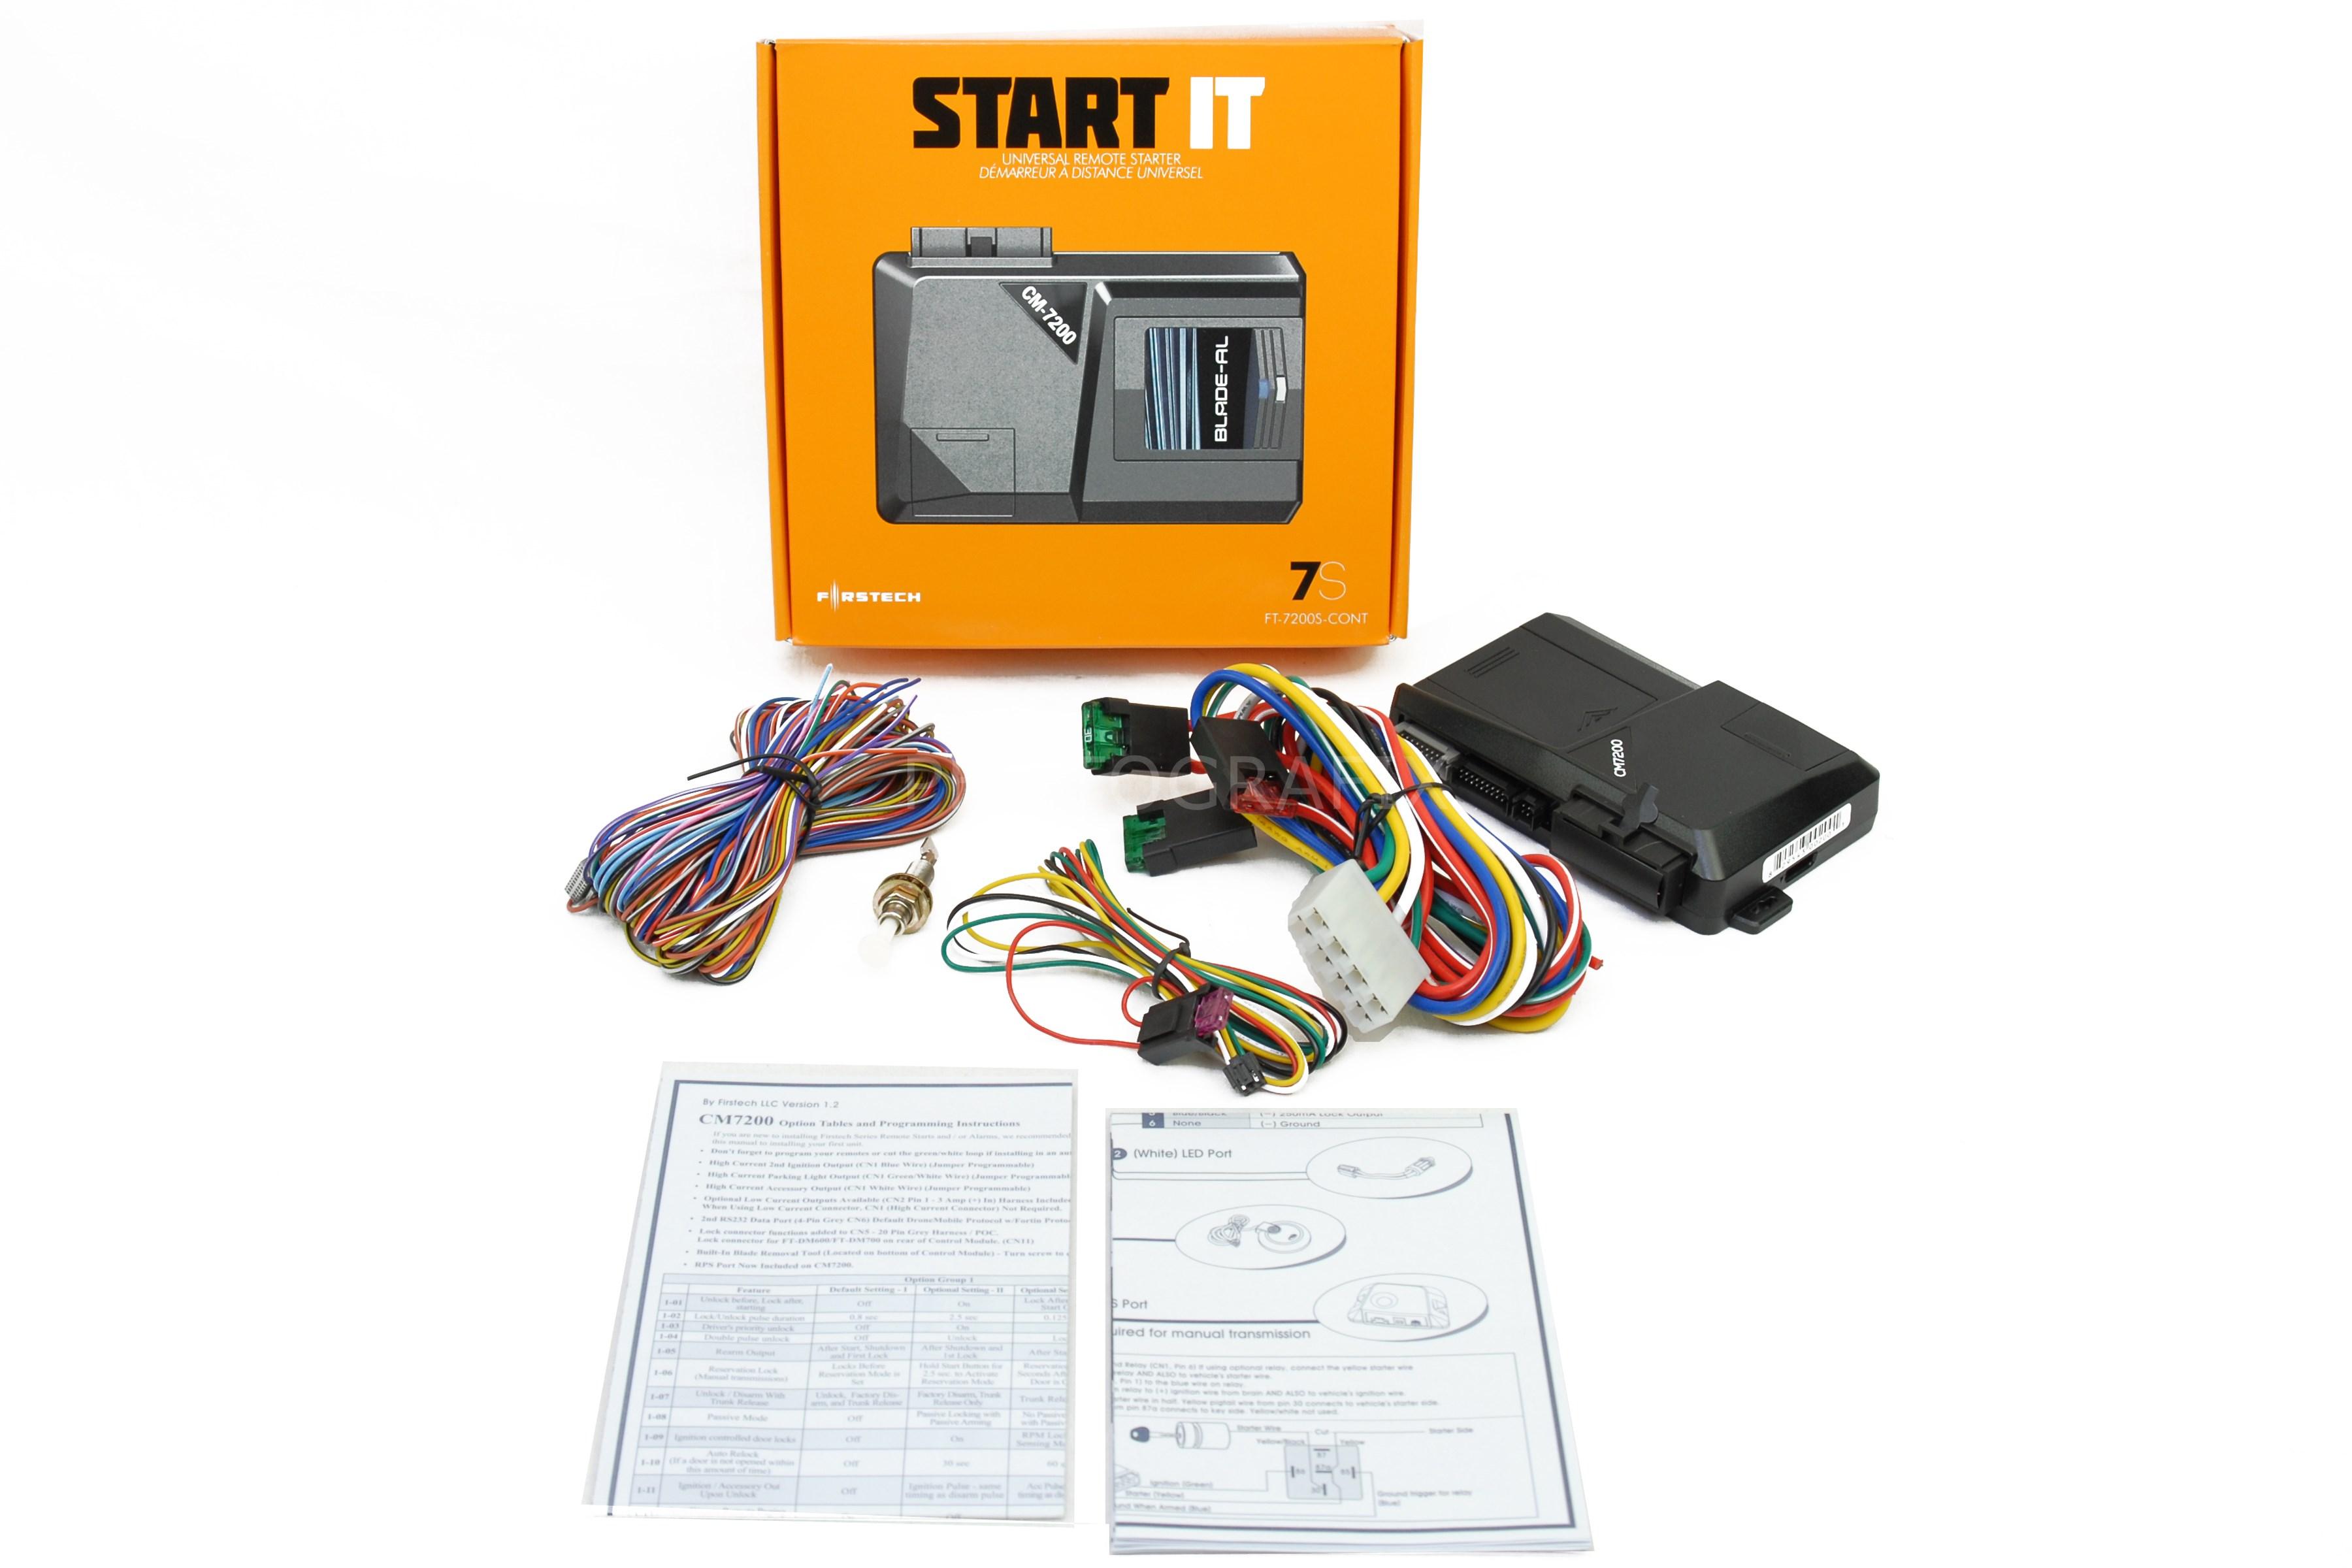 compustar ft7200s remote keyless remote start control ft 7200s cont rh ebay com Compustar Remote Programming Compustar Remote Starter Manual CS-700S